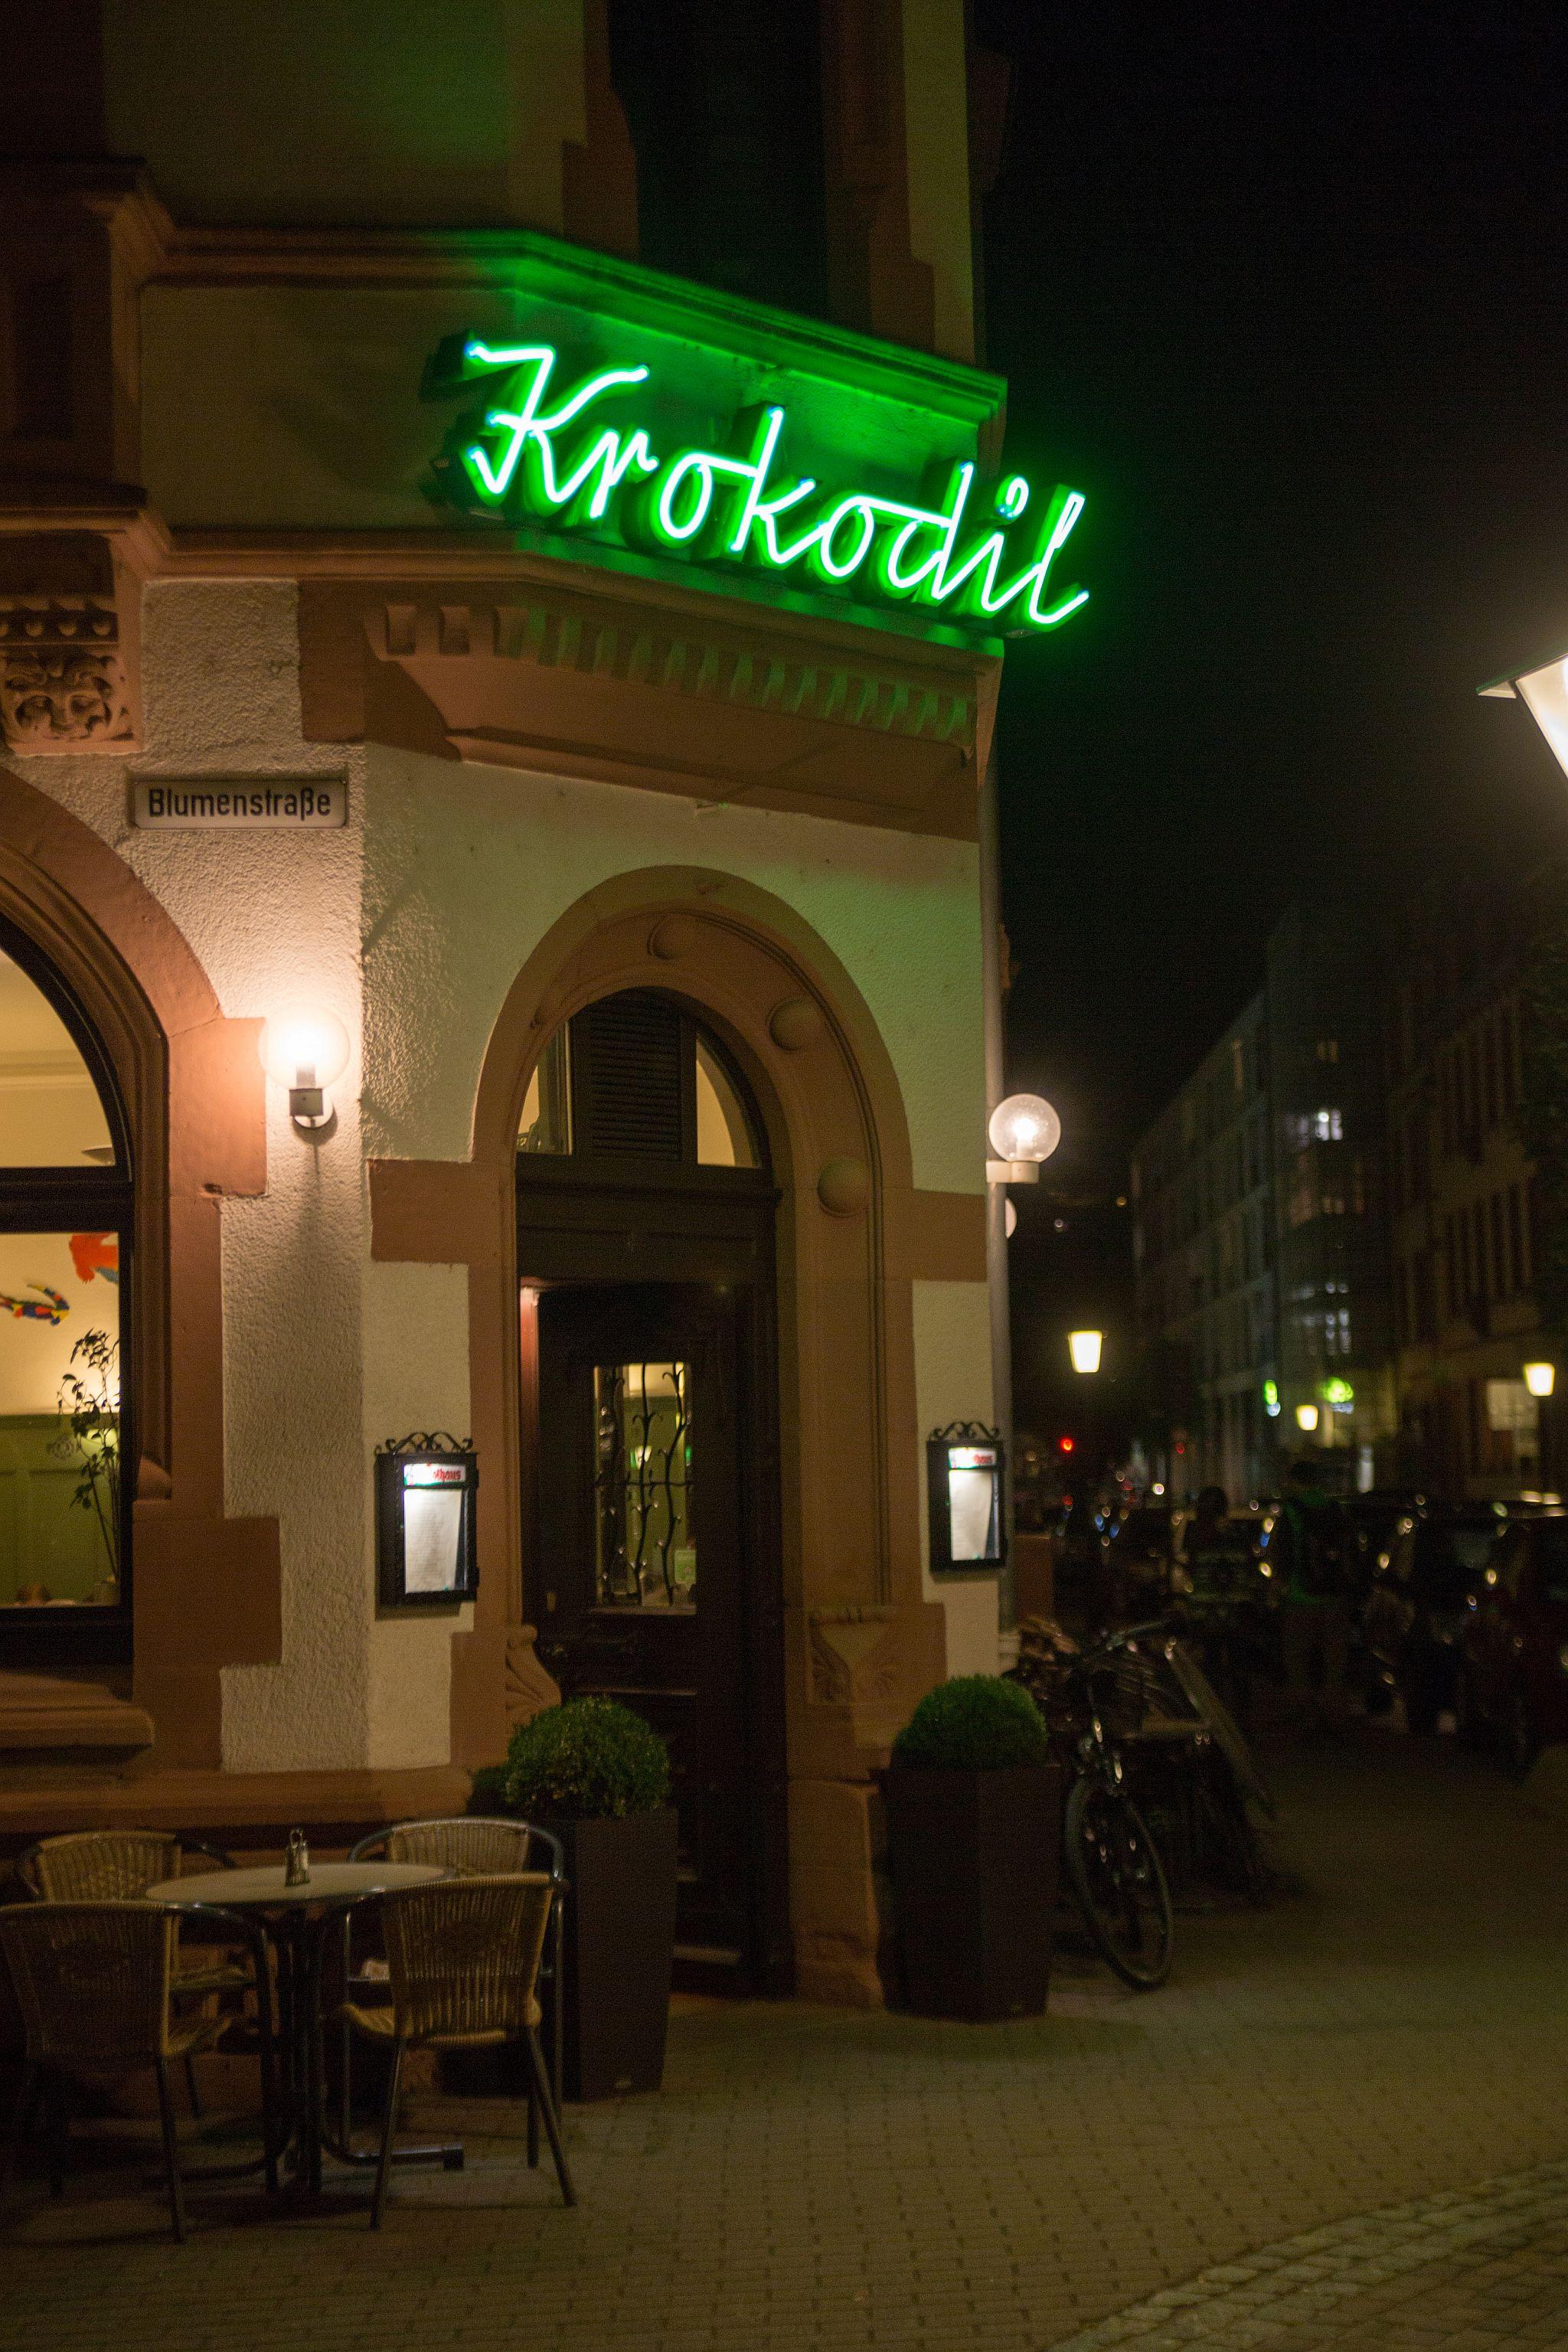 Krokodil Restaurant & Hotel - Rhein-Neckar-Wiki